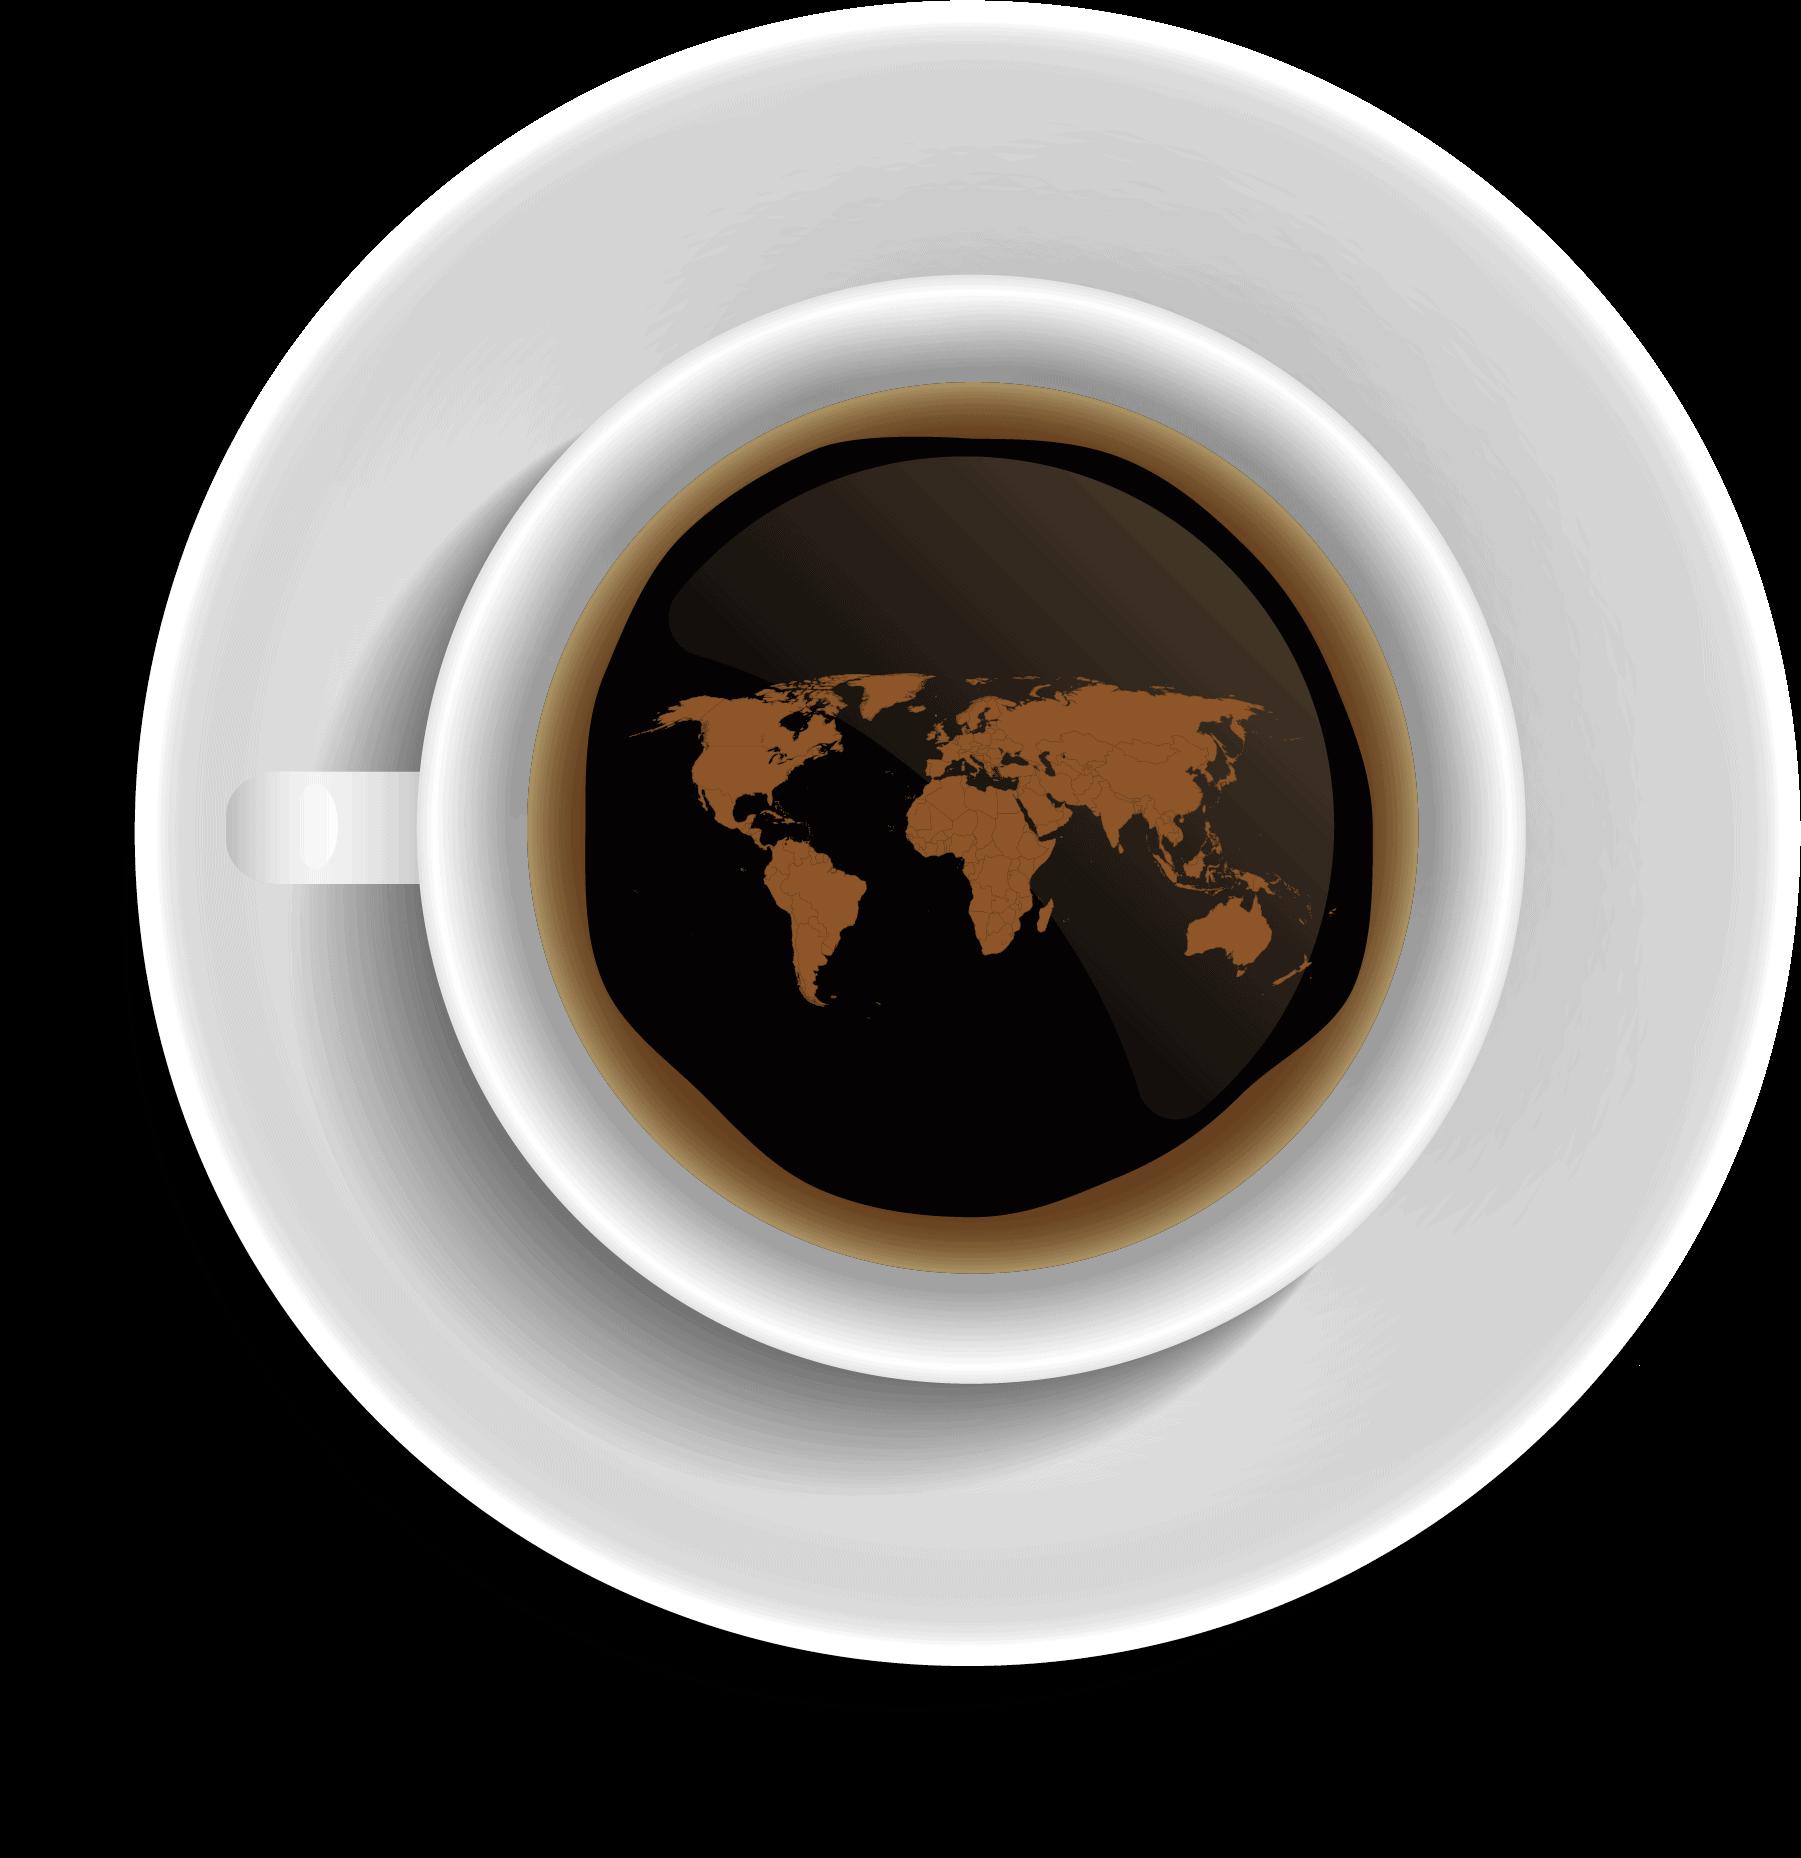 rwandan coffee, specialty coffee, empowerment, best coffee, good coffee, genocide,